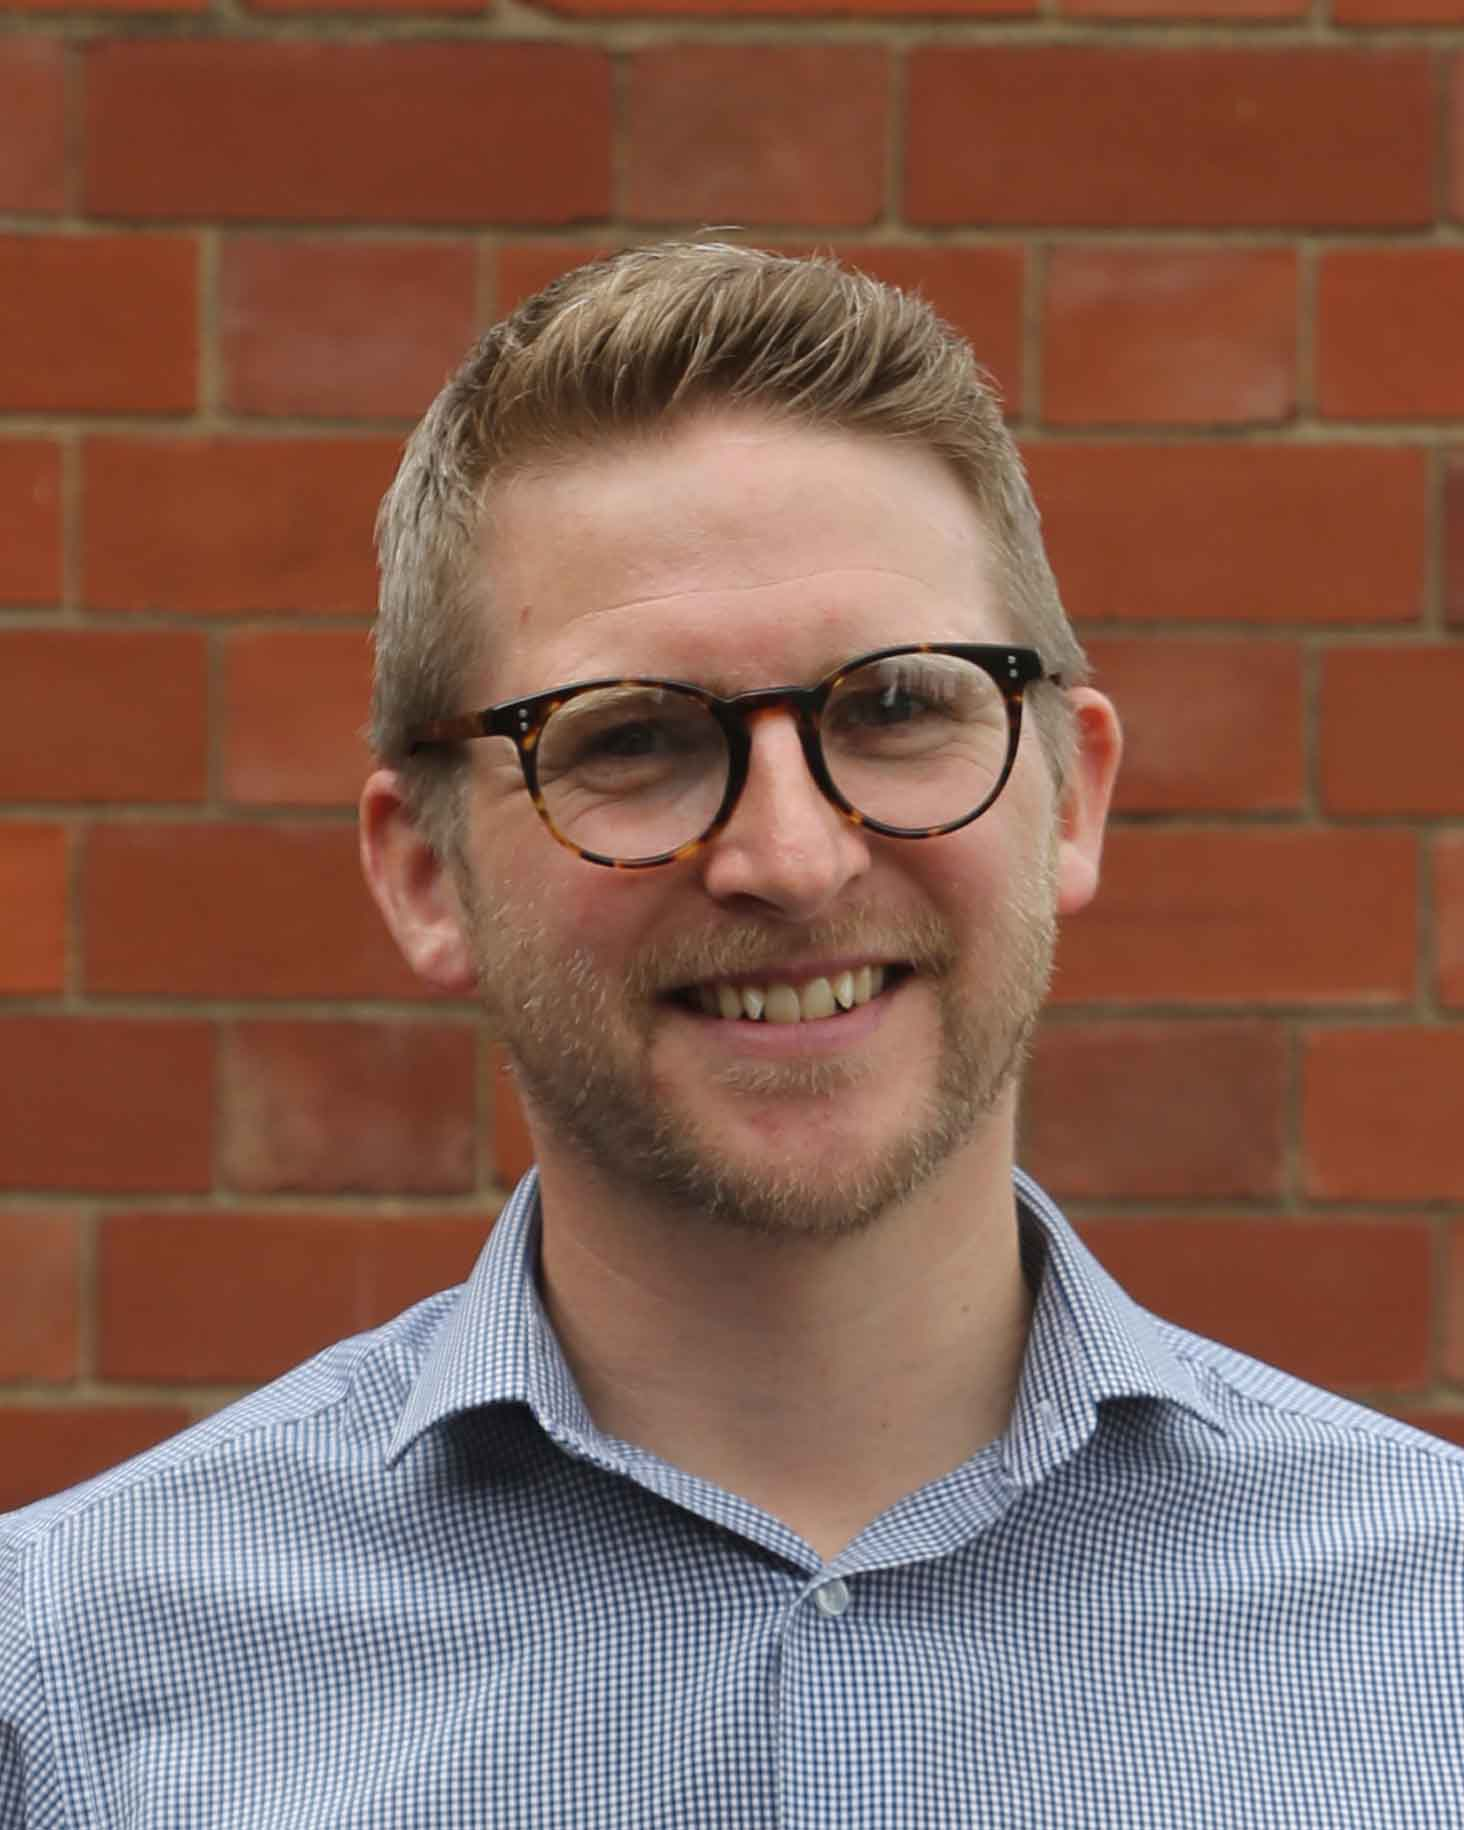 Matthew Bastock